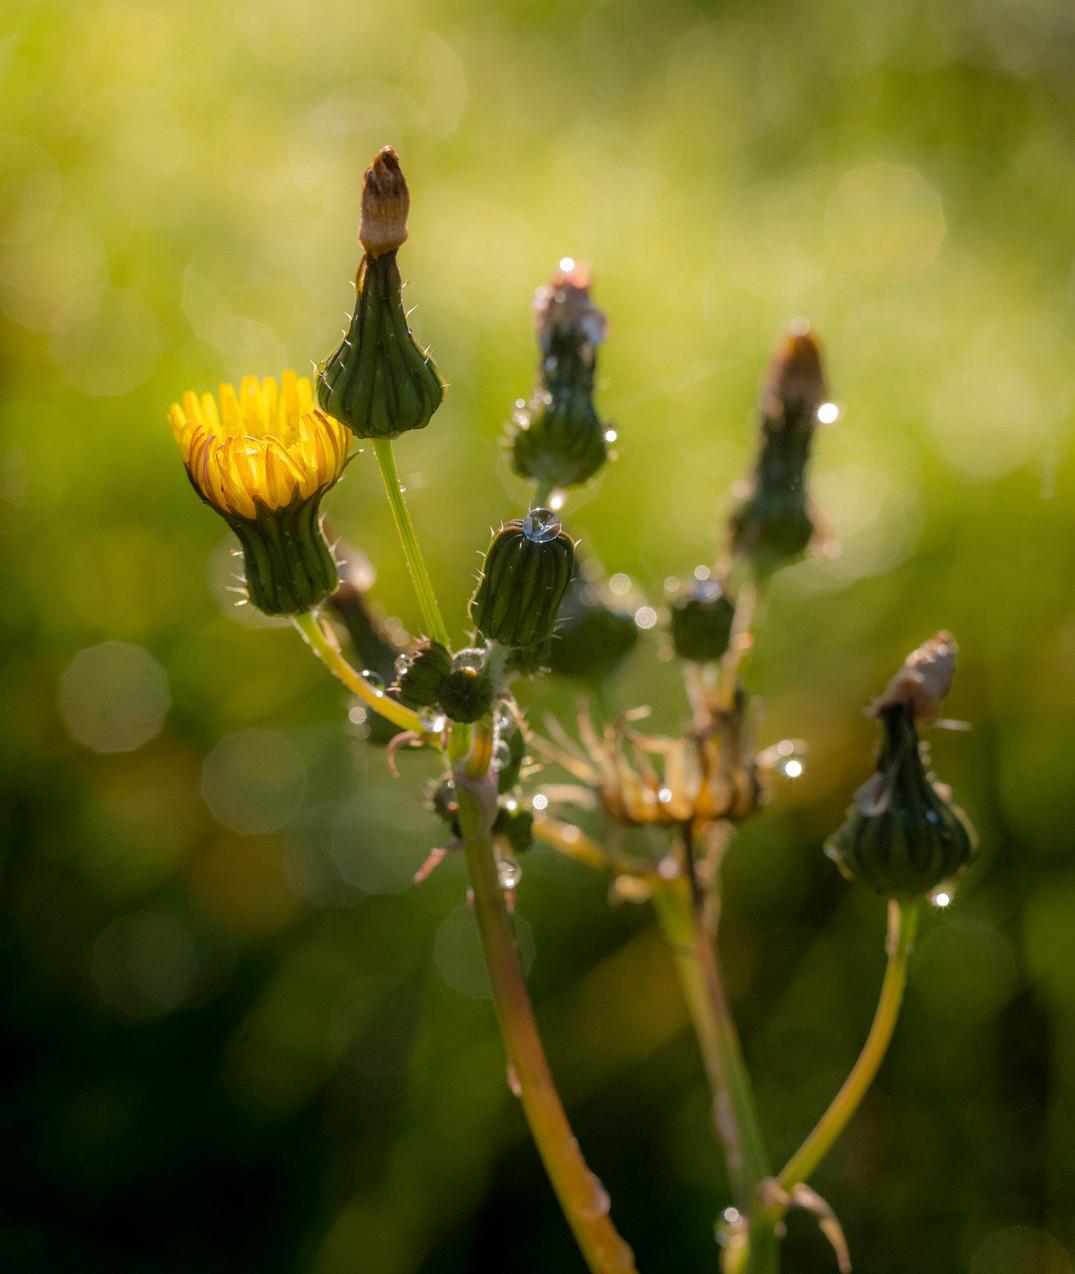 Siddho-Photography-Nature-C-10.jpg